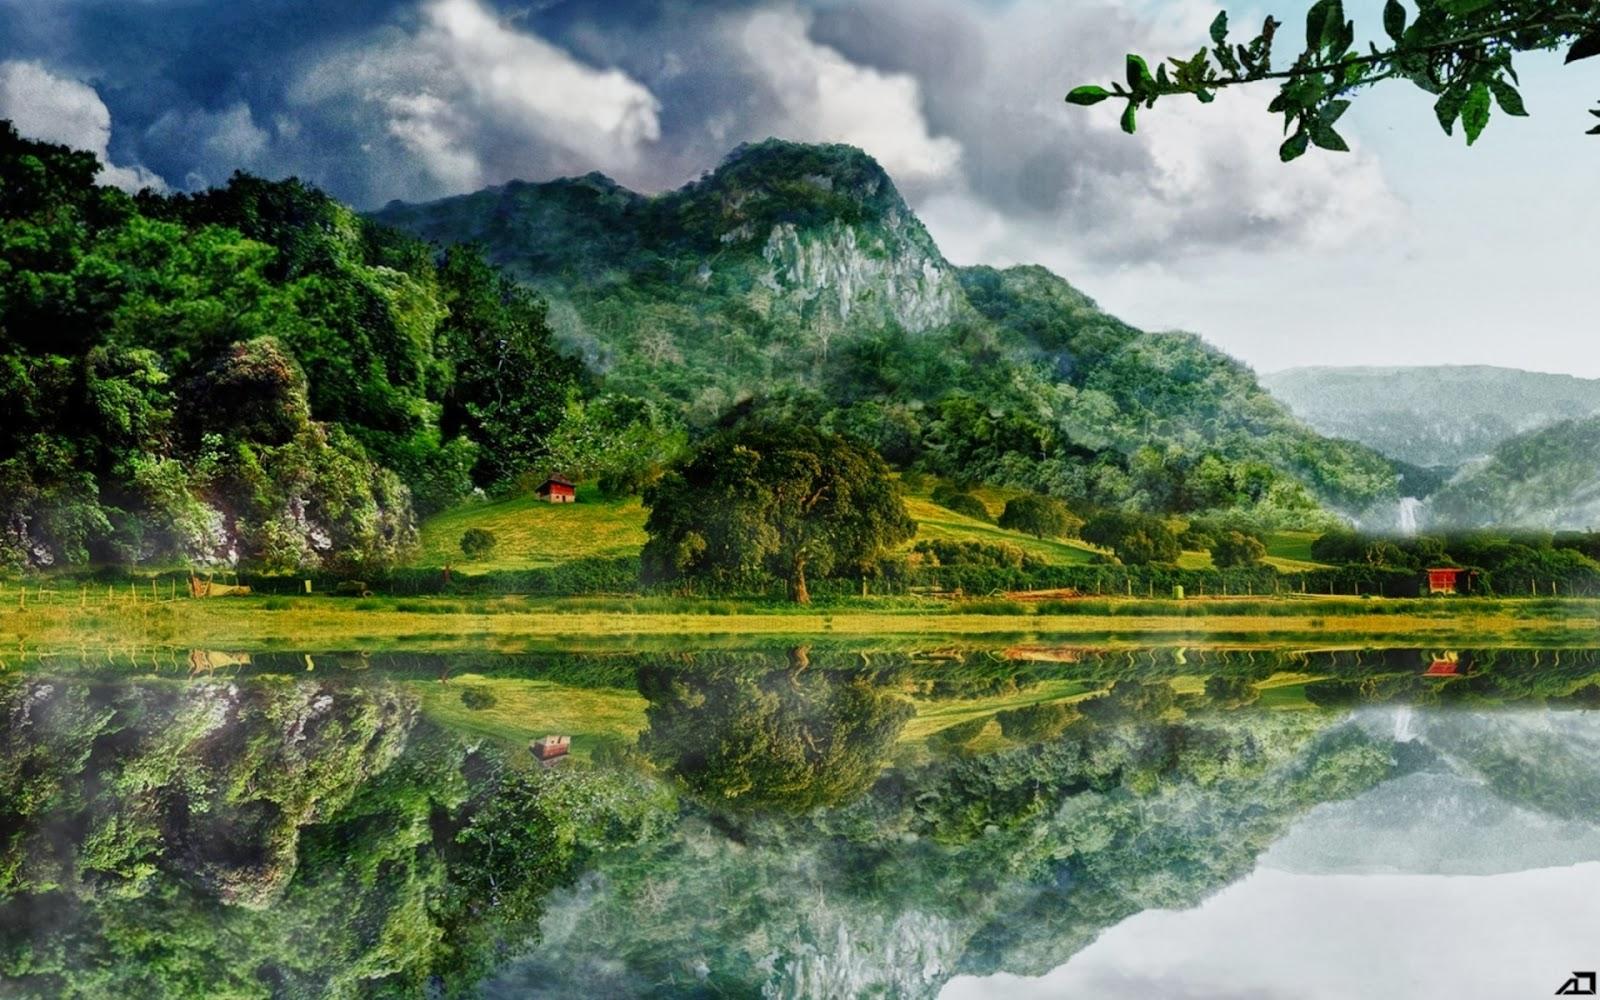 Contoh Naskah Pidato Tentang Alam | ADDY SUMOHARJO BLOG